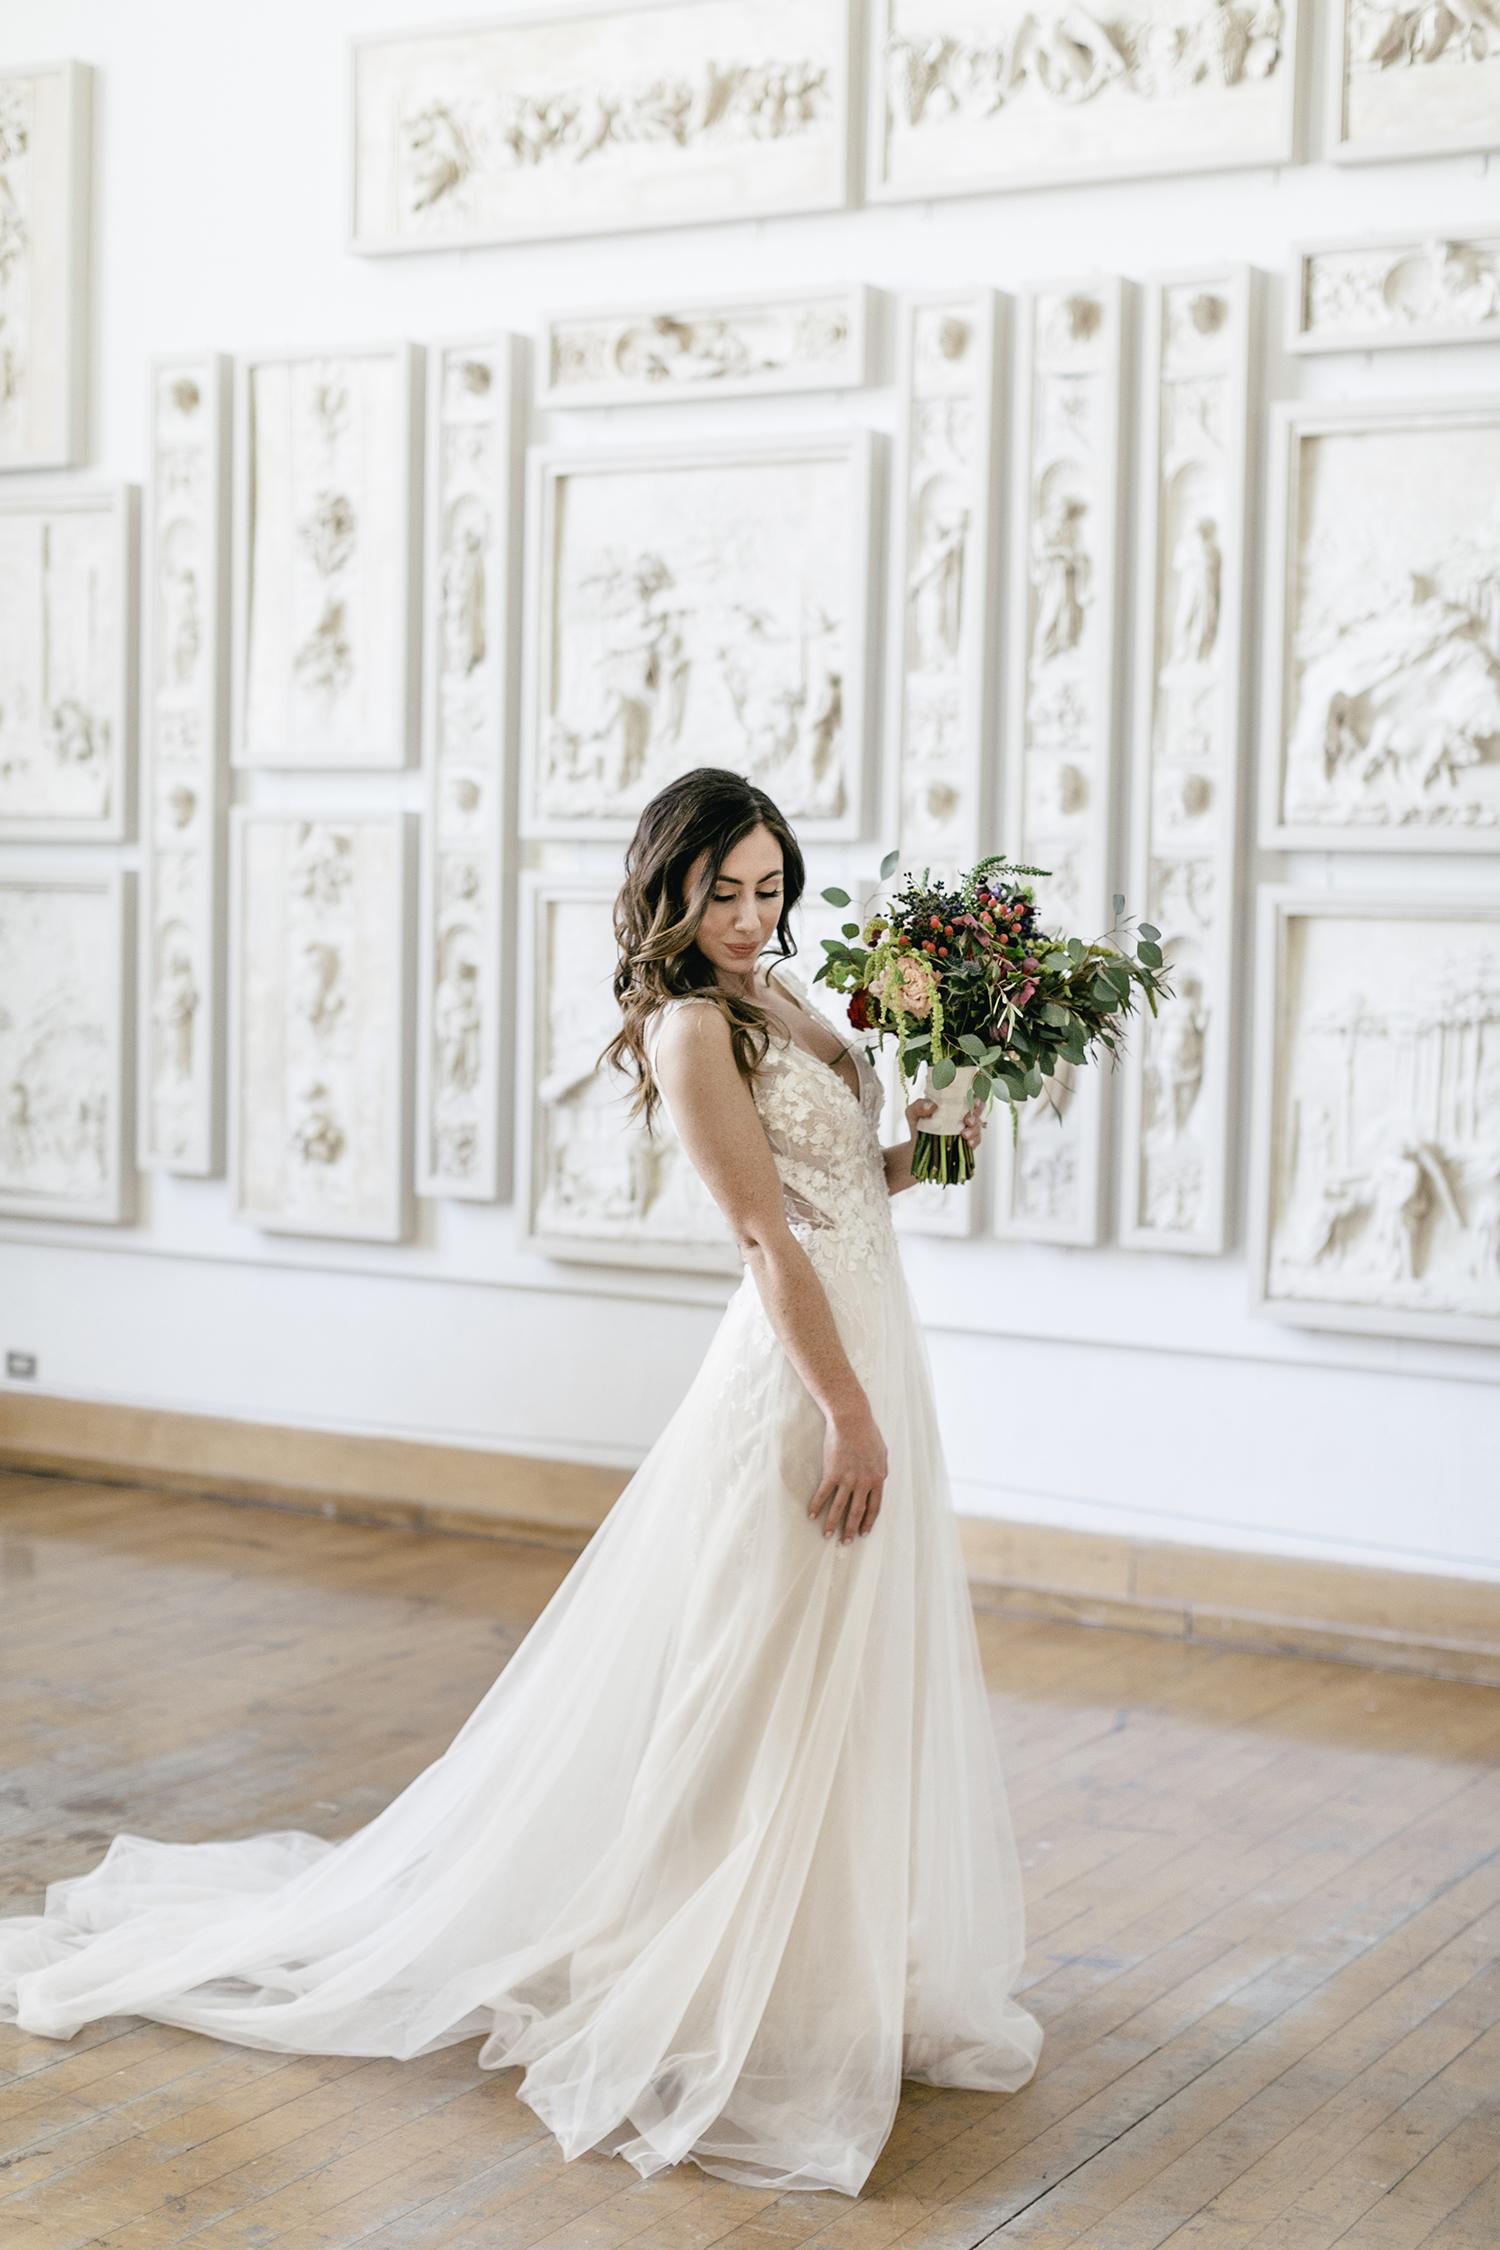 photography-wedding-weddings-natural-candid-pafa-pennsylvania academy-philadephia-philly-philadelphia wedding-mixed race-editorial-modern-fine-art-016.JPG